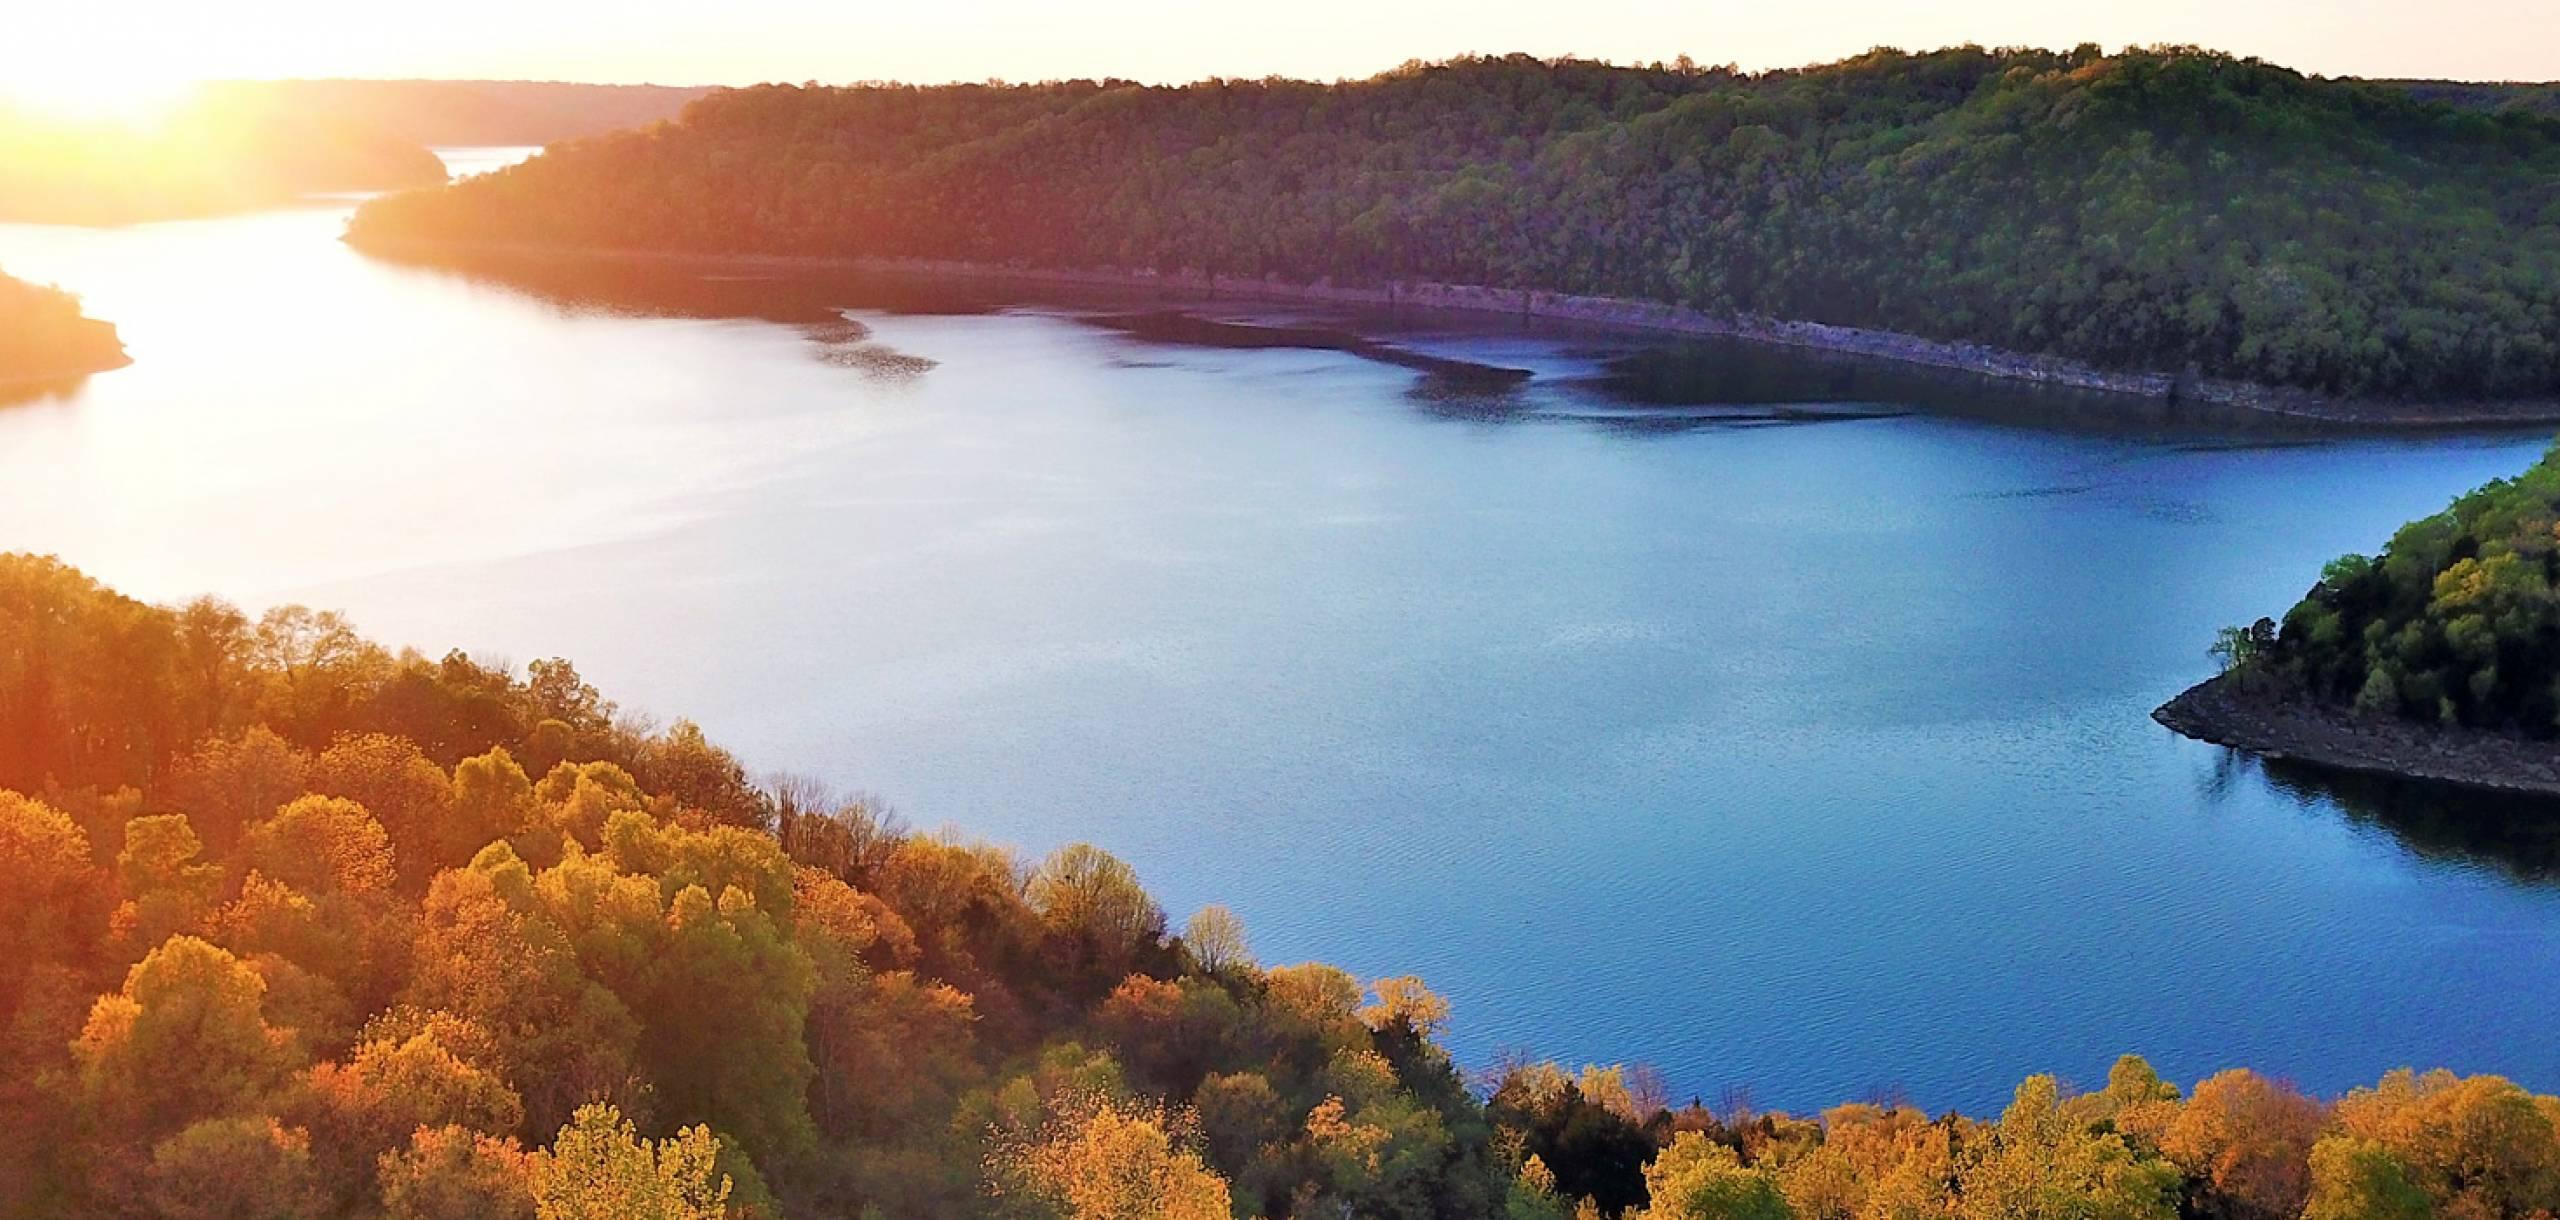 Sunset at Center Hill Lake